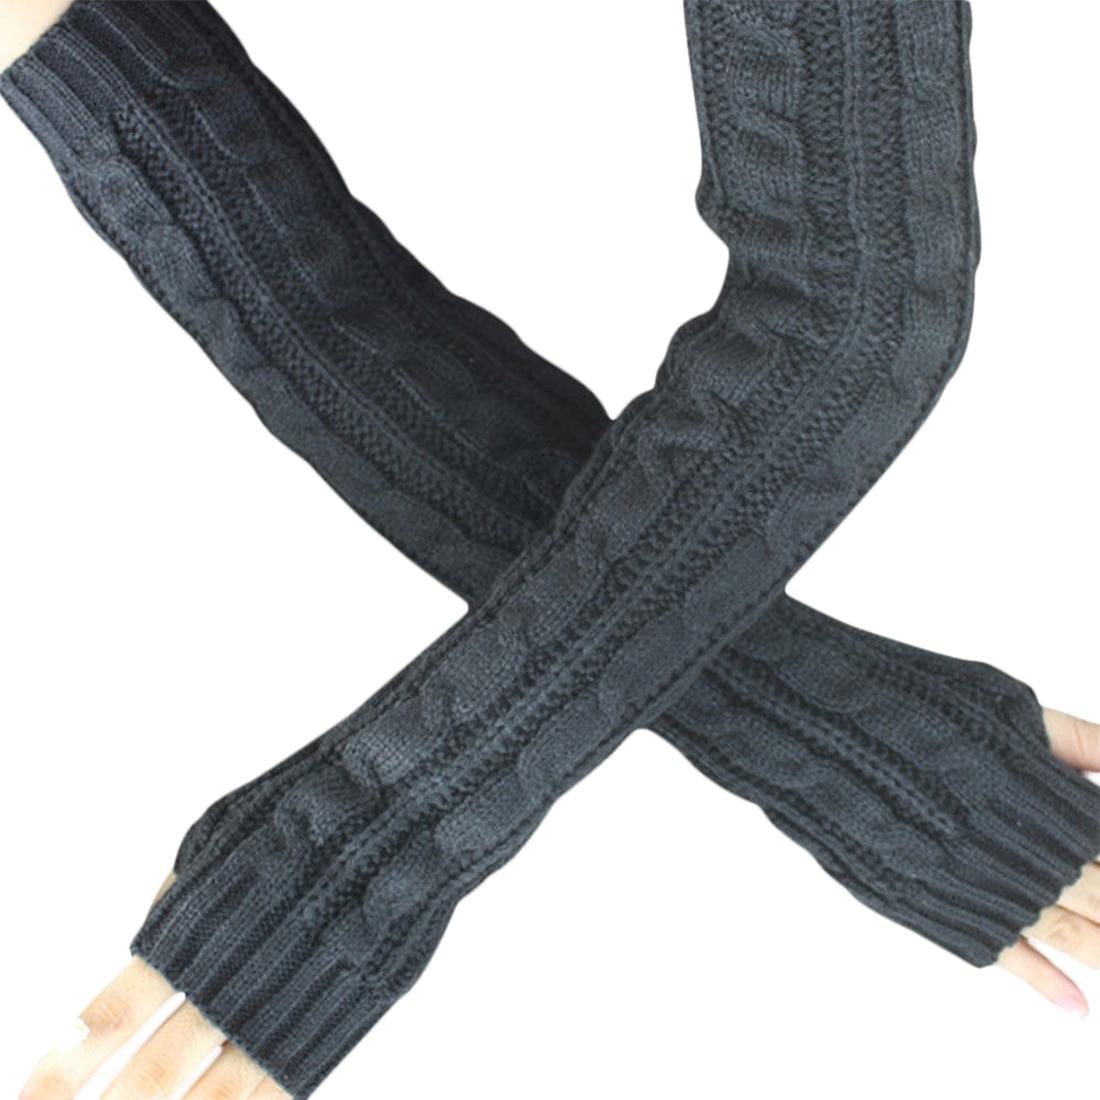 Fashion Winter Women Men Gloves Unisex Arm Warmer Long Fingerless knit Mitten dark gray